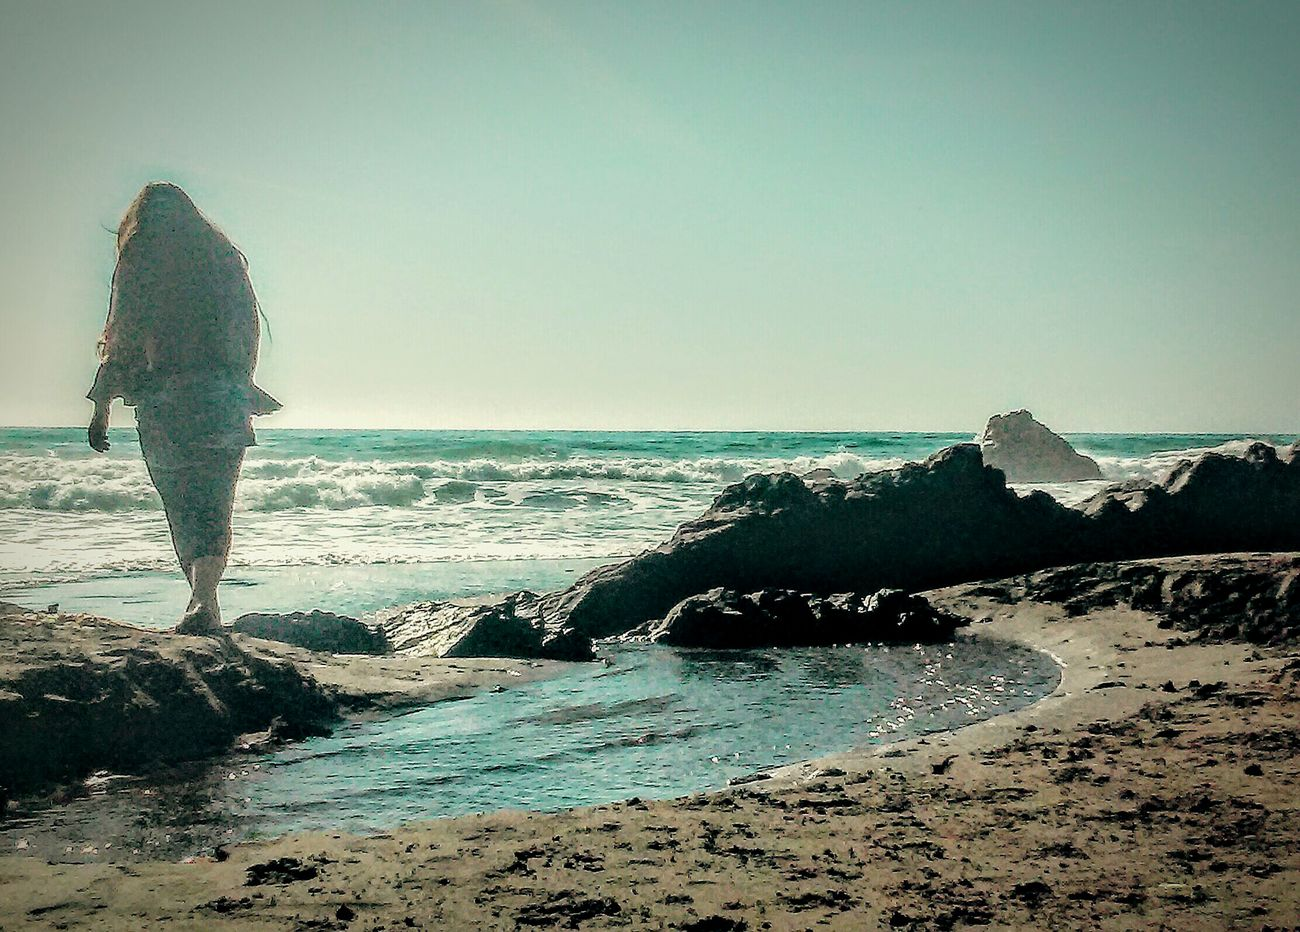 Edge Of The World the ocean speaks her language. zoe Ocean Pacific Ocean EyeEm Kids Enjoying Life Eyeem Northen California Enjoying The Sun Northern California